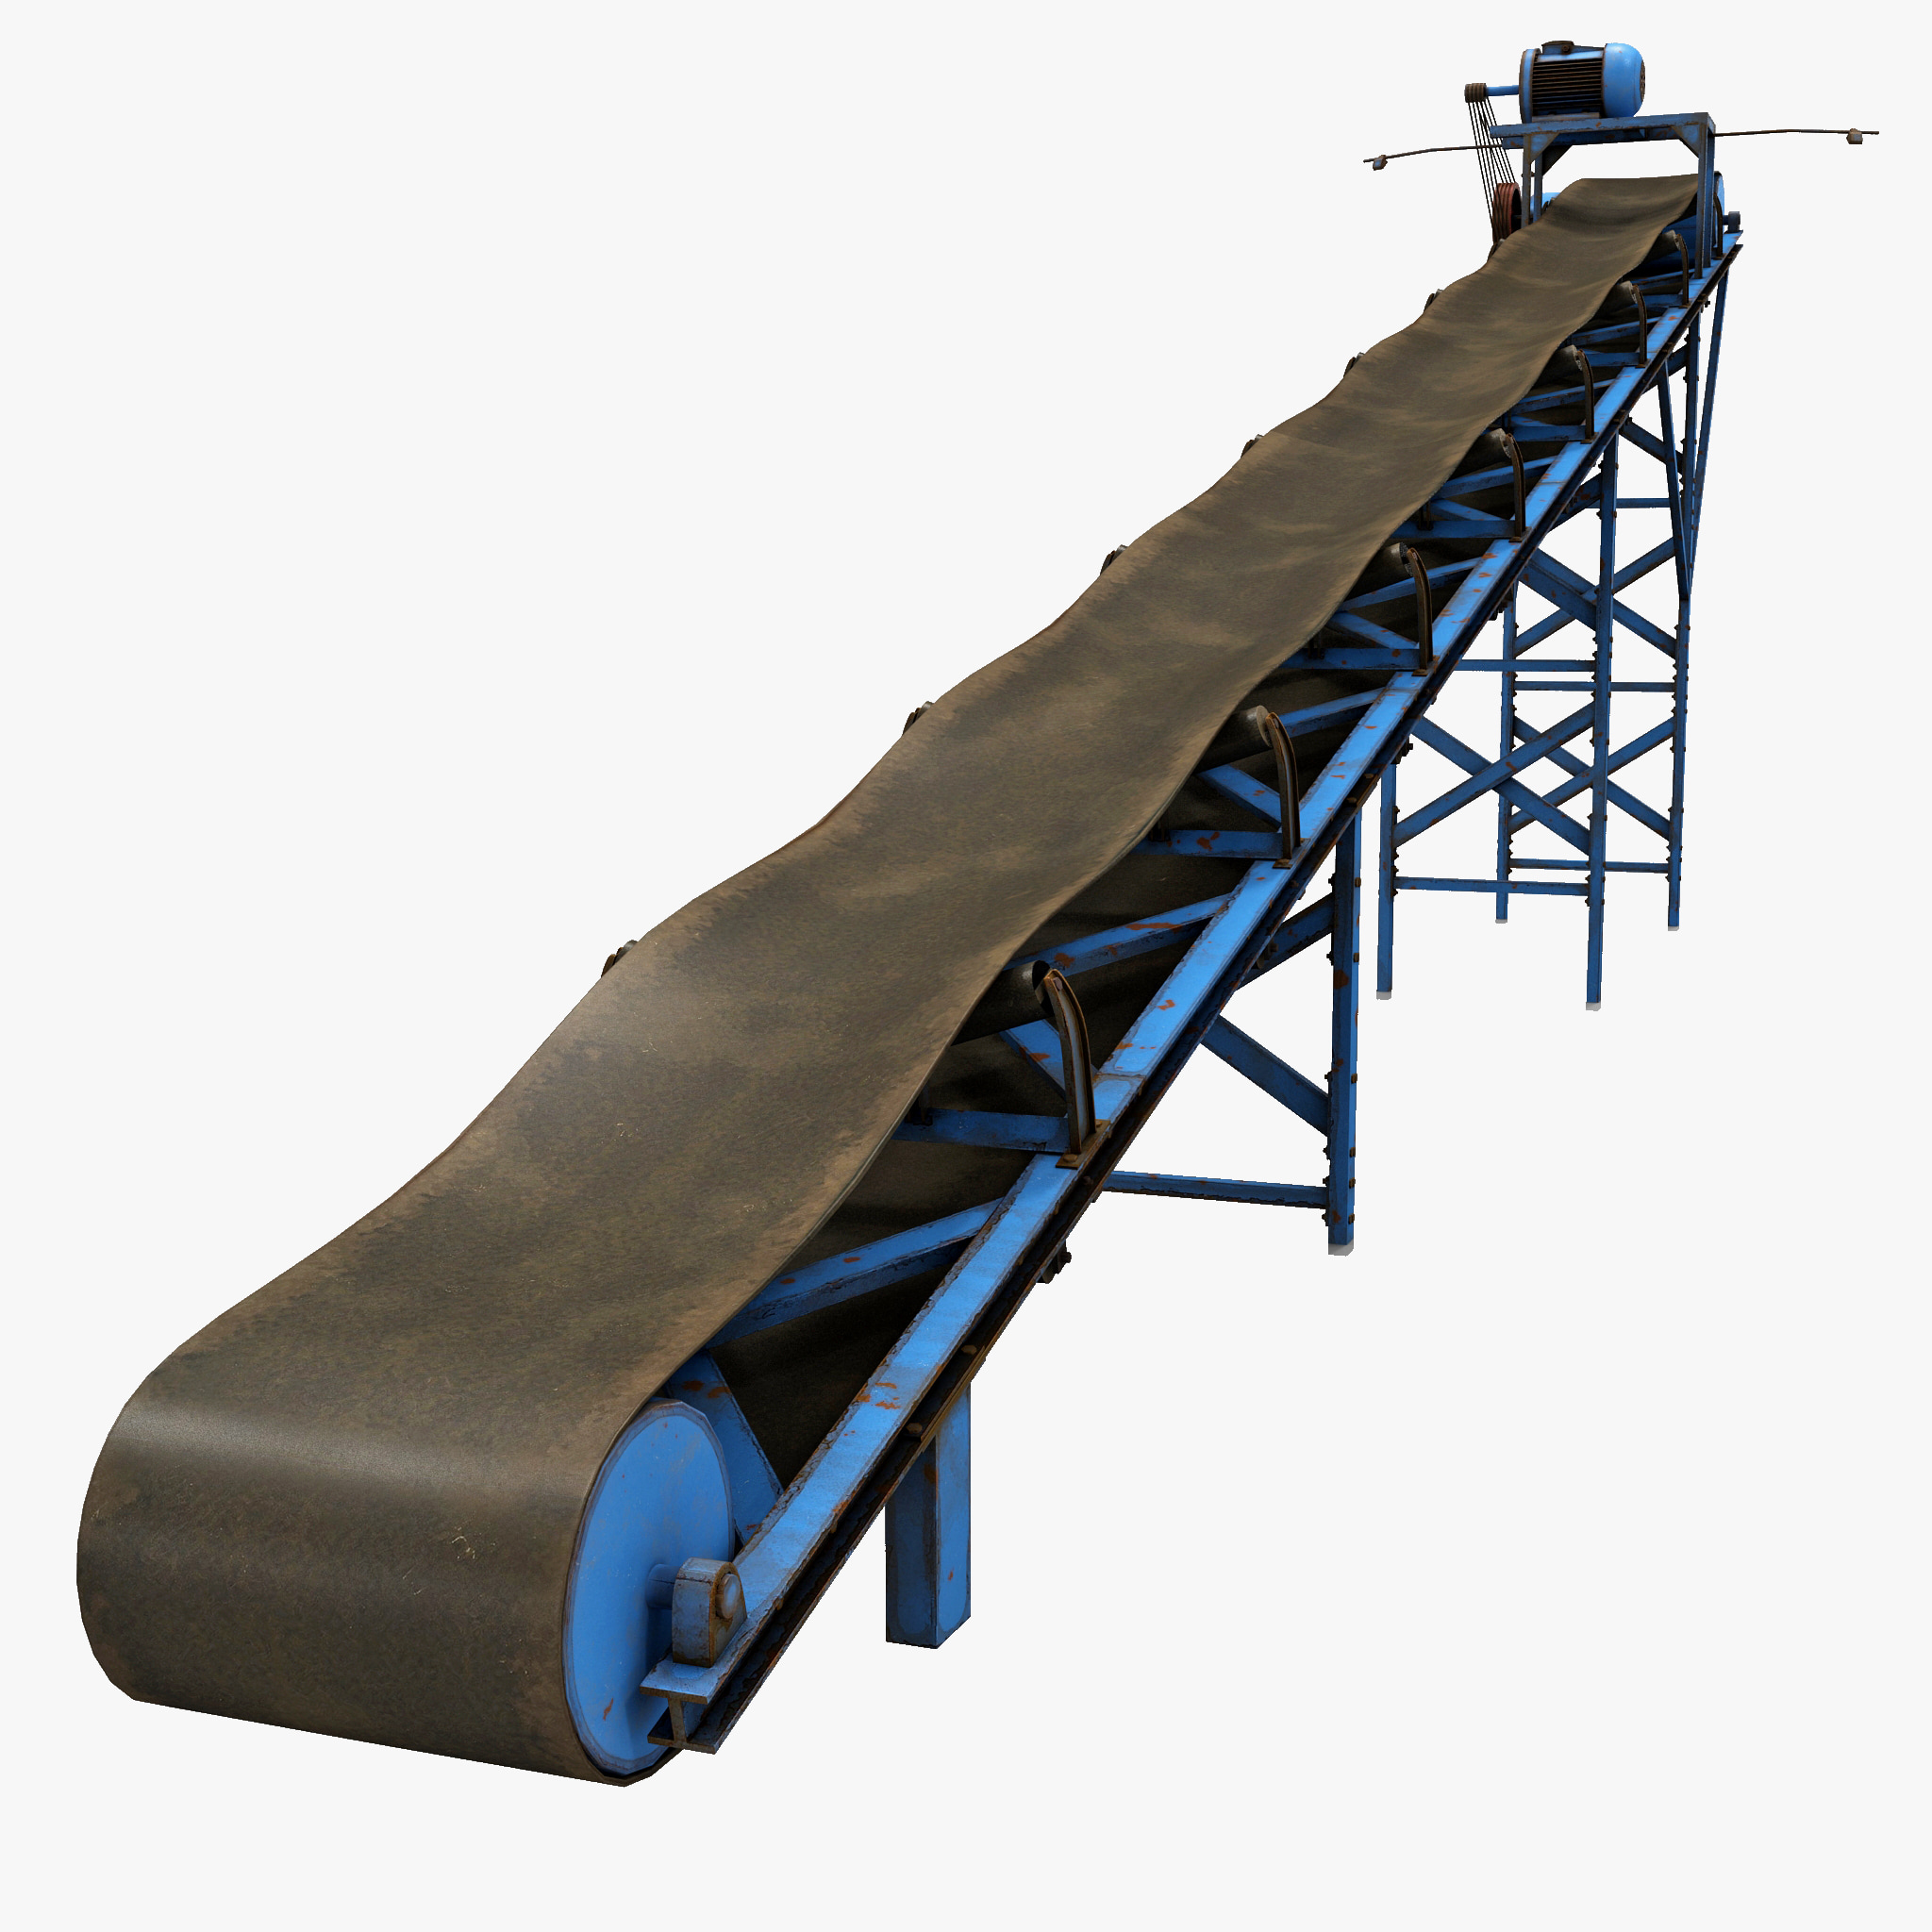 3d Conveyor Belt Model